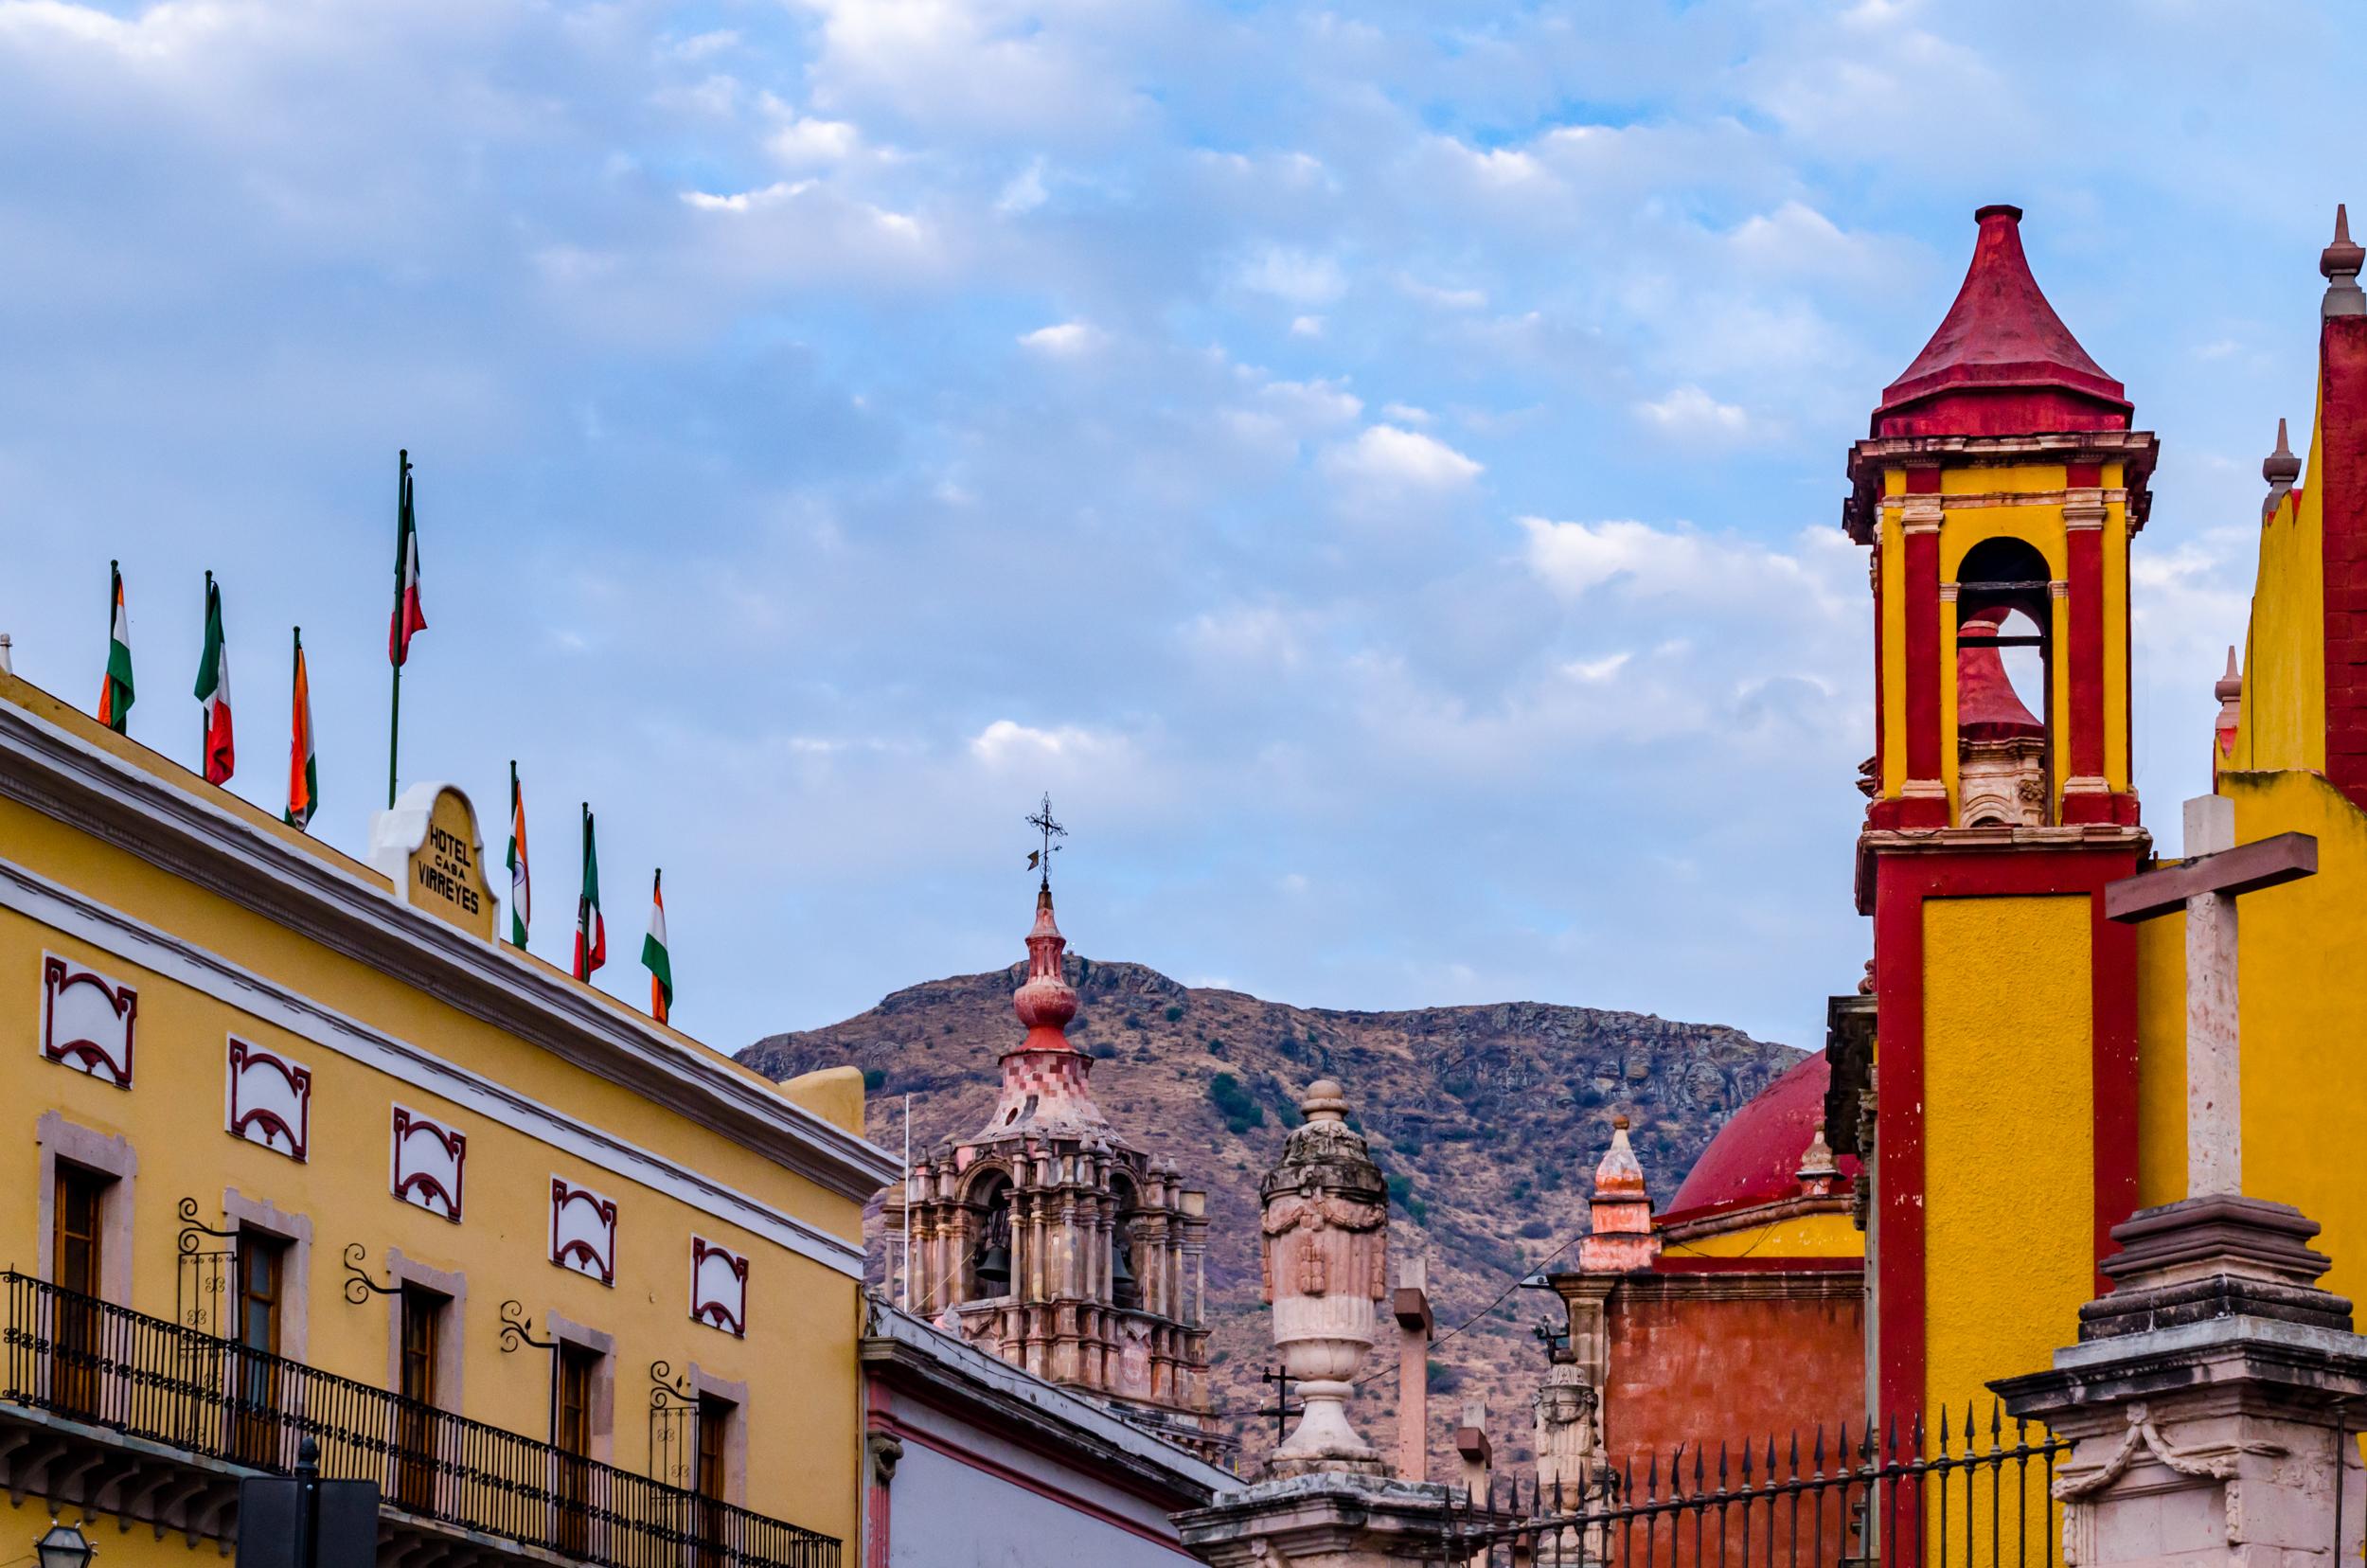 Images of Guanajuato - Nadine Burzler (160 of 175).jpg